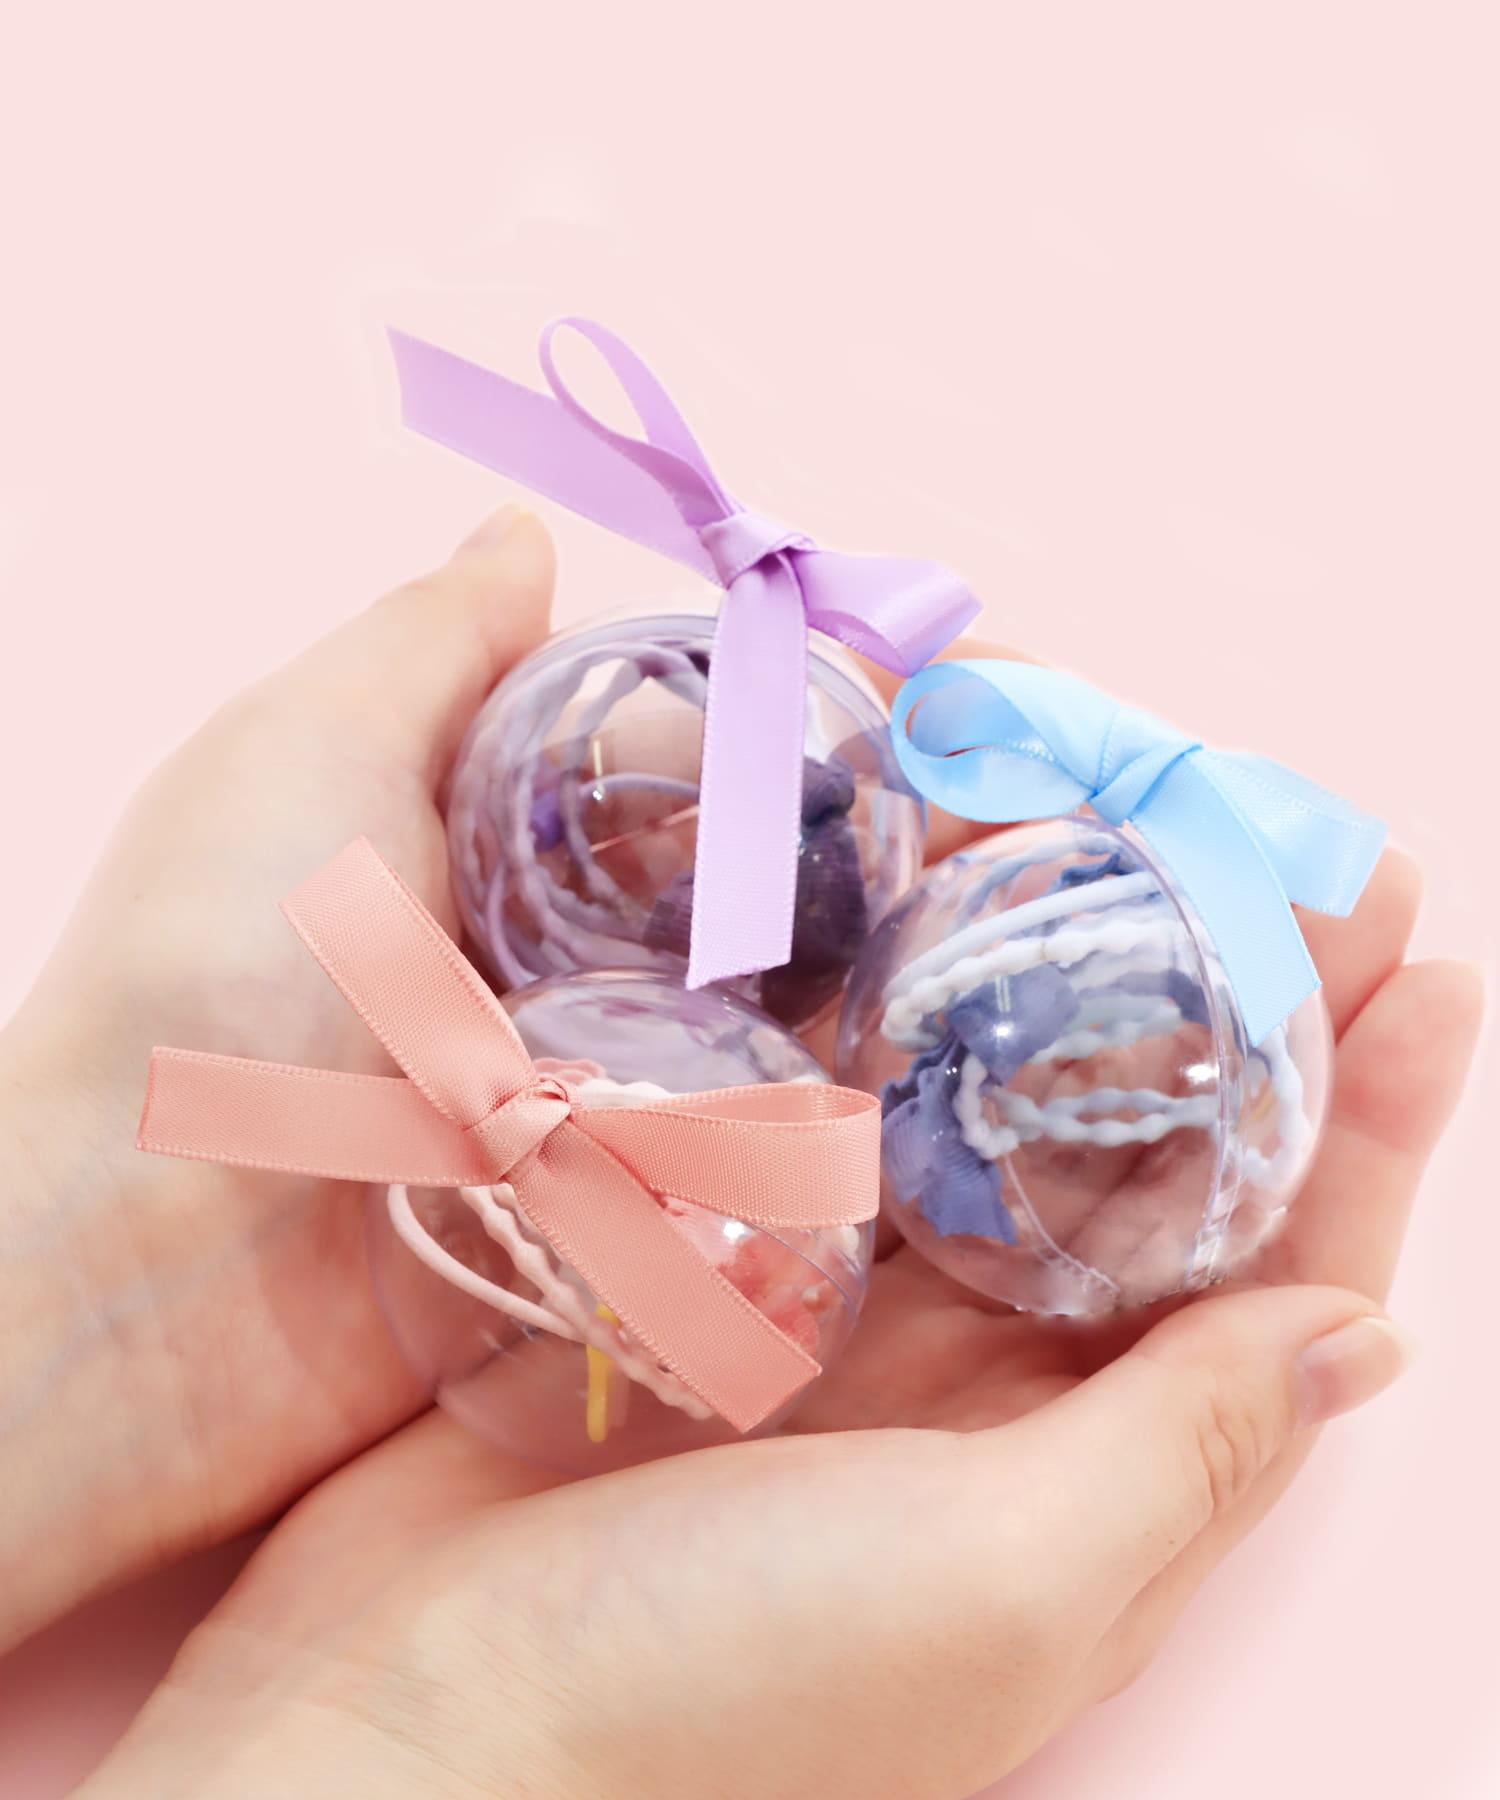 3COINS(スリーコインズ) メンズ 【ASOKO】カプセルリボンヘアゴム ピンク